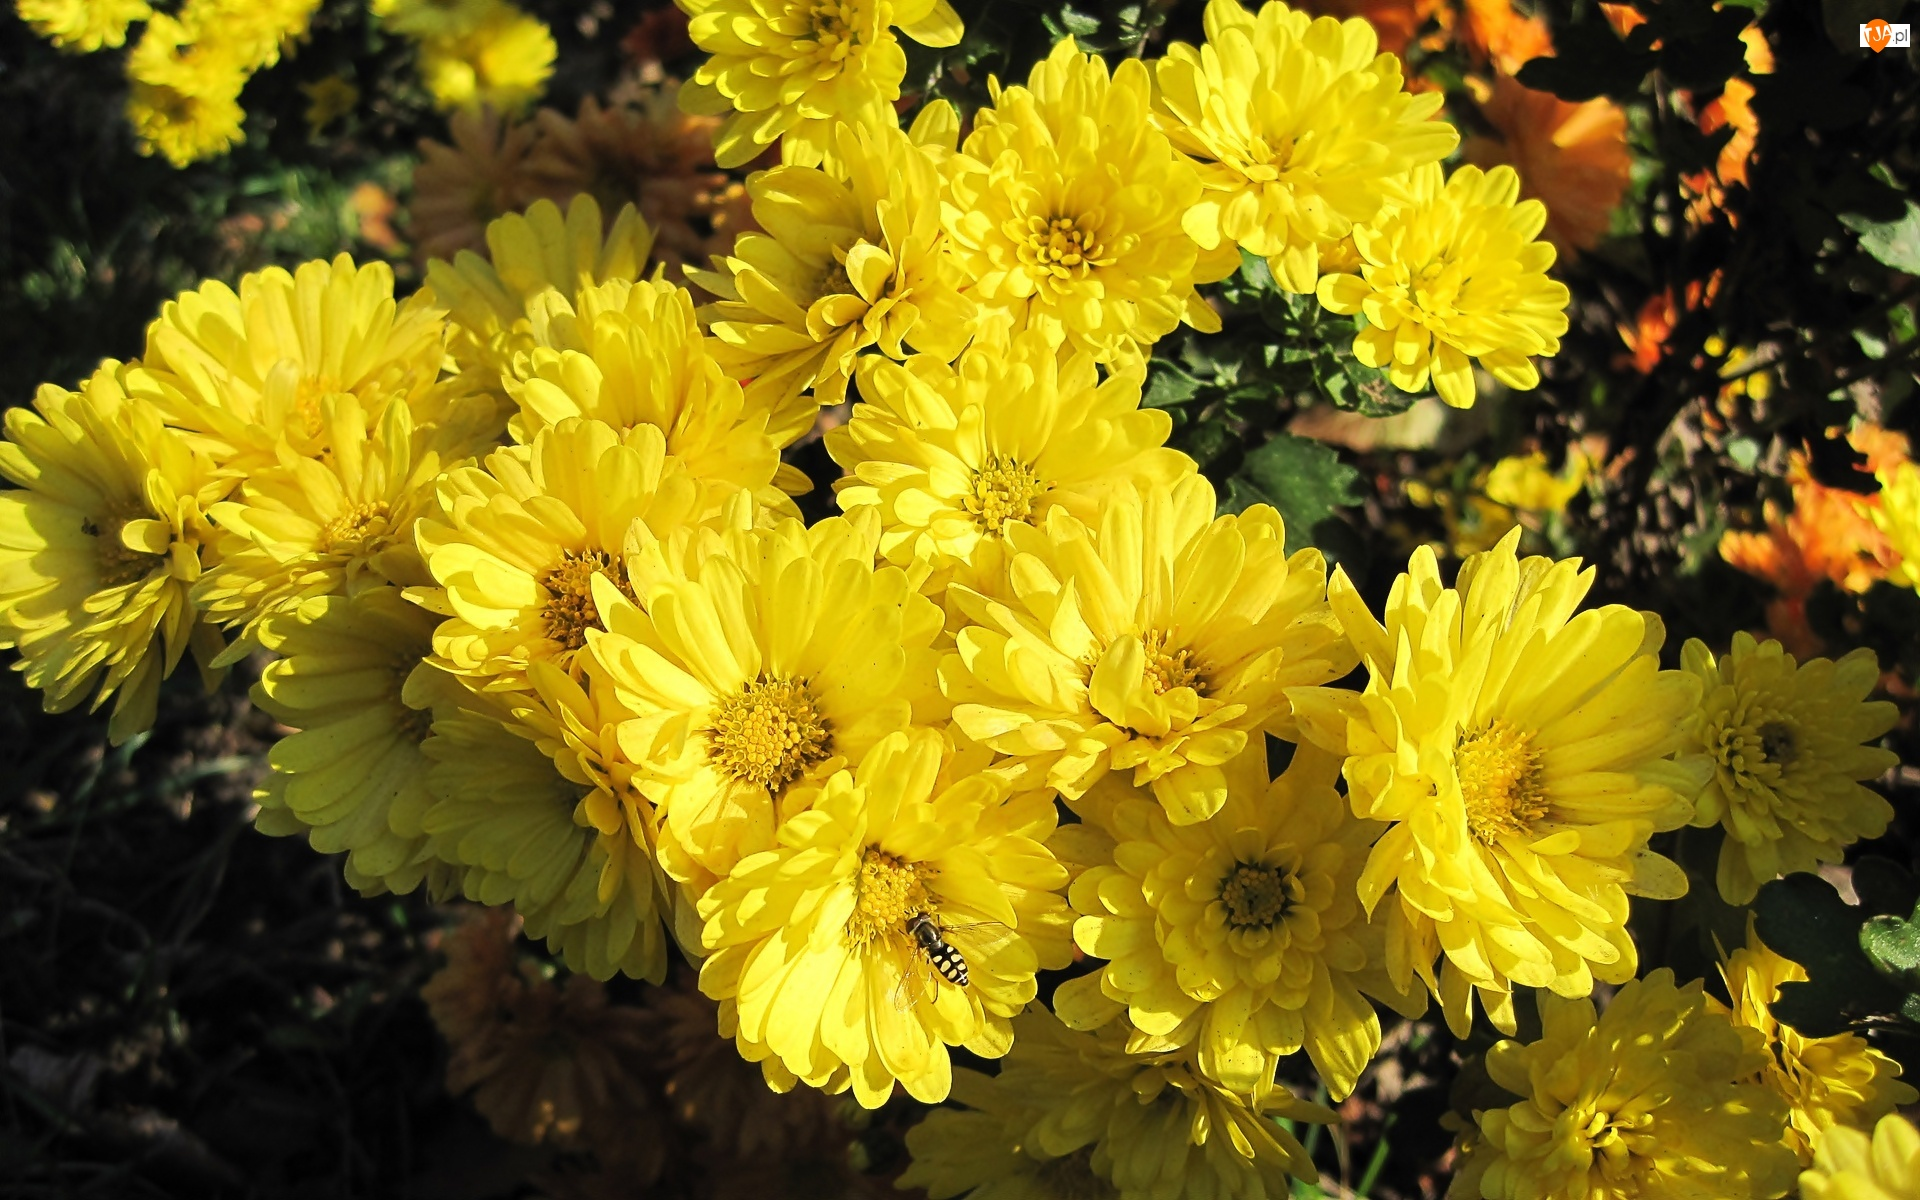 Owad, Żółte, Chryzantemy